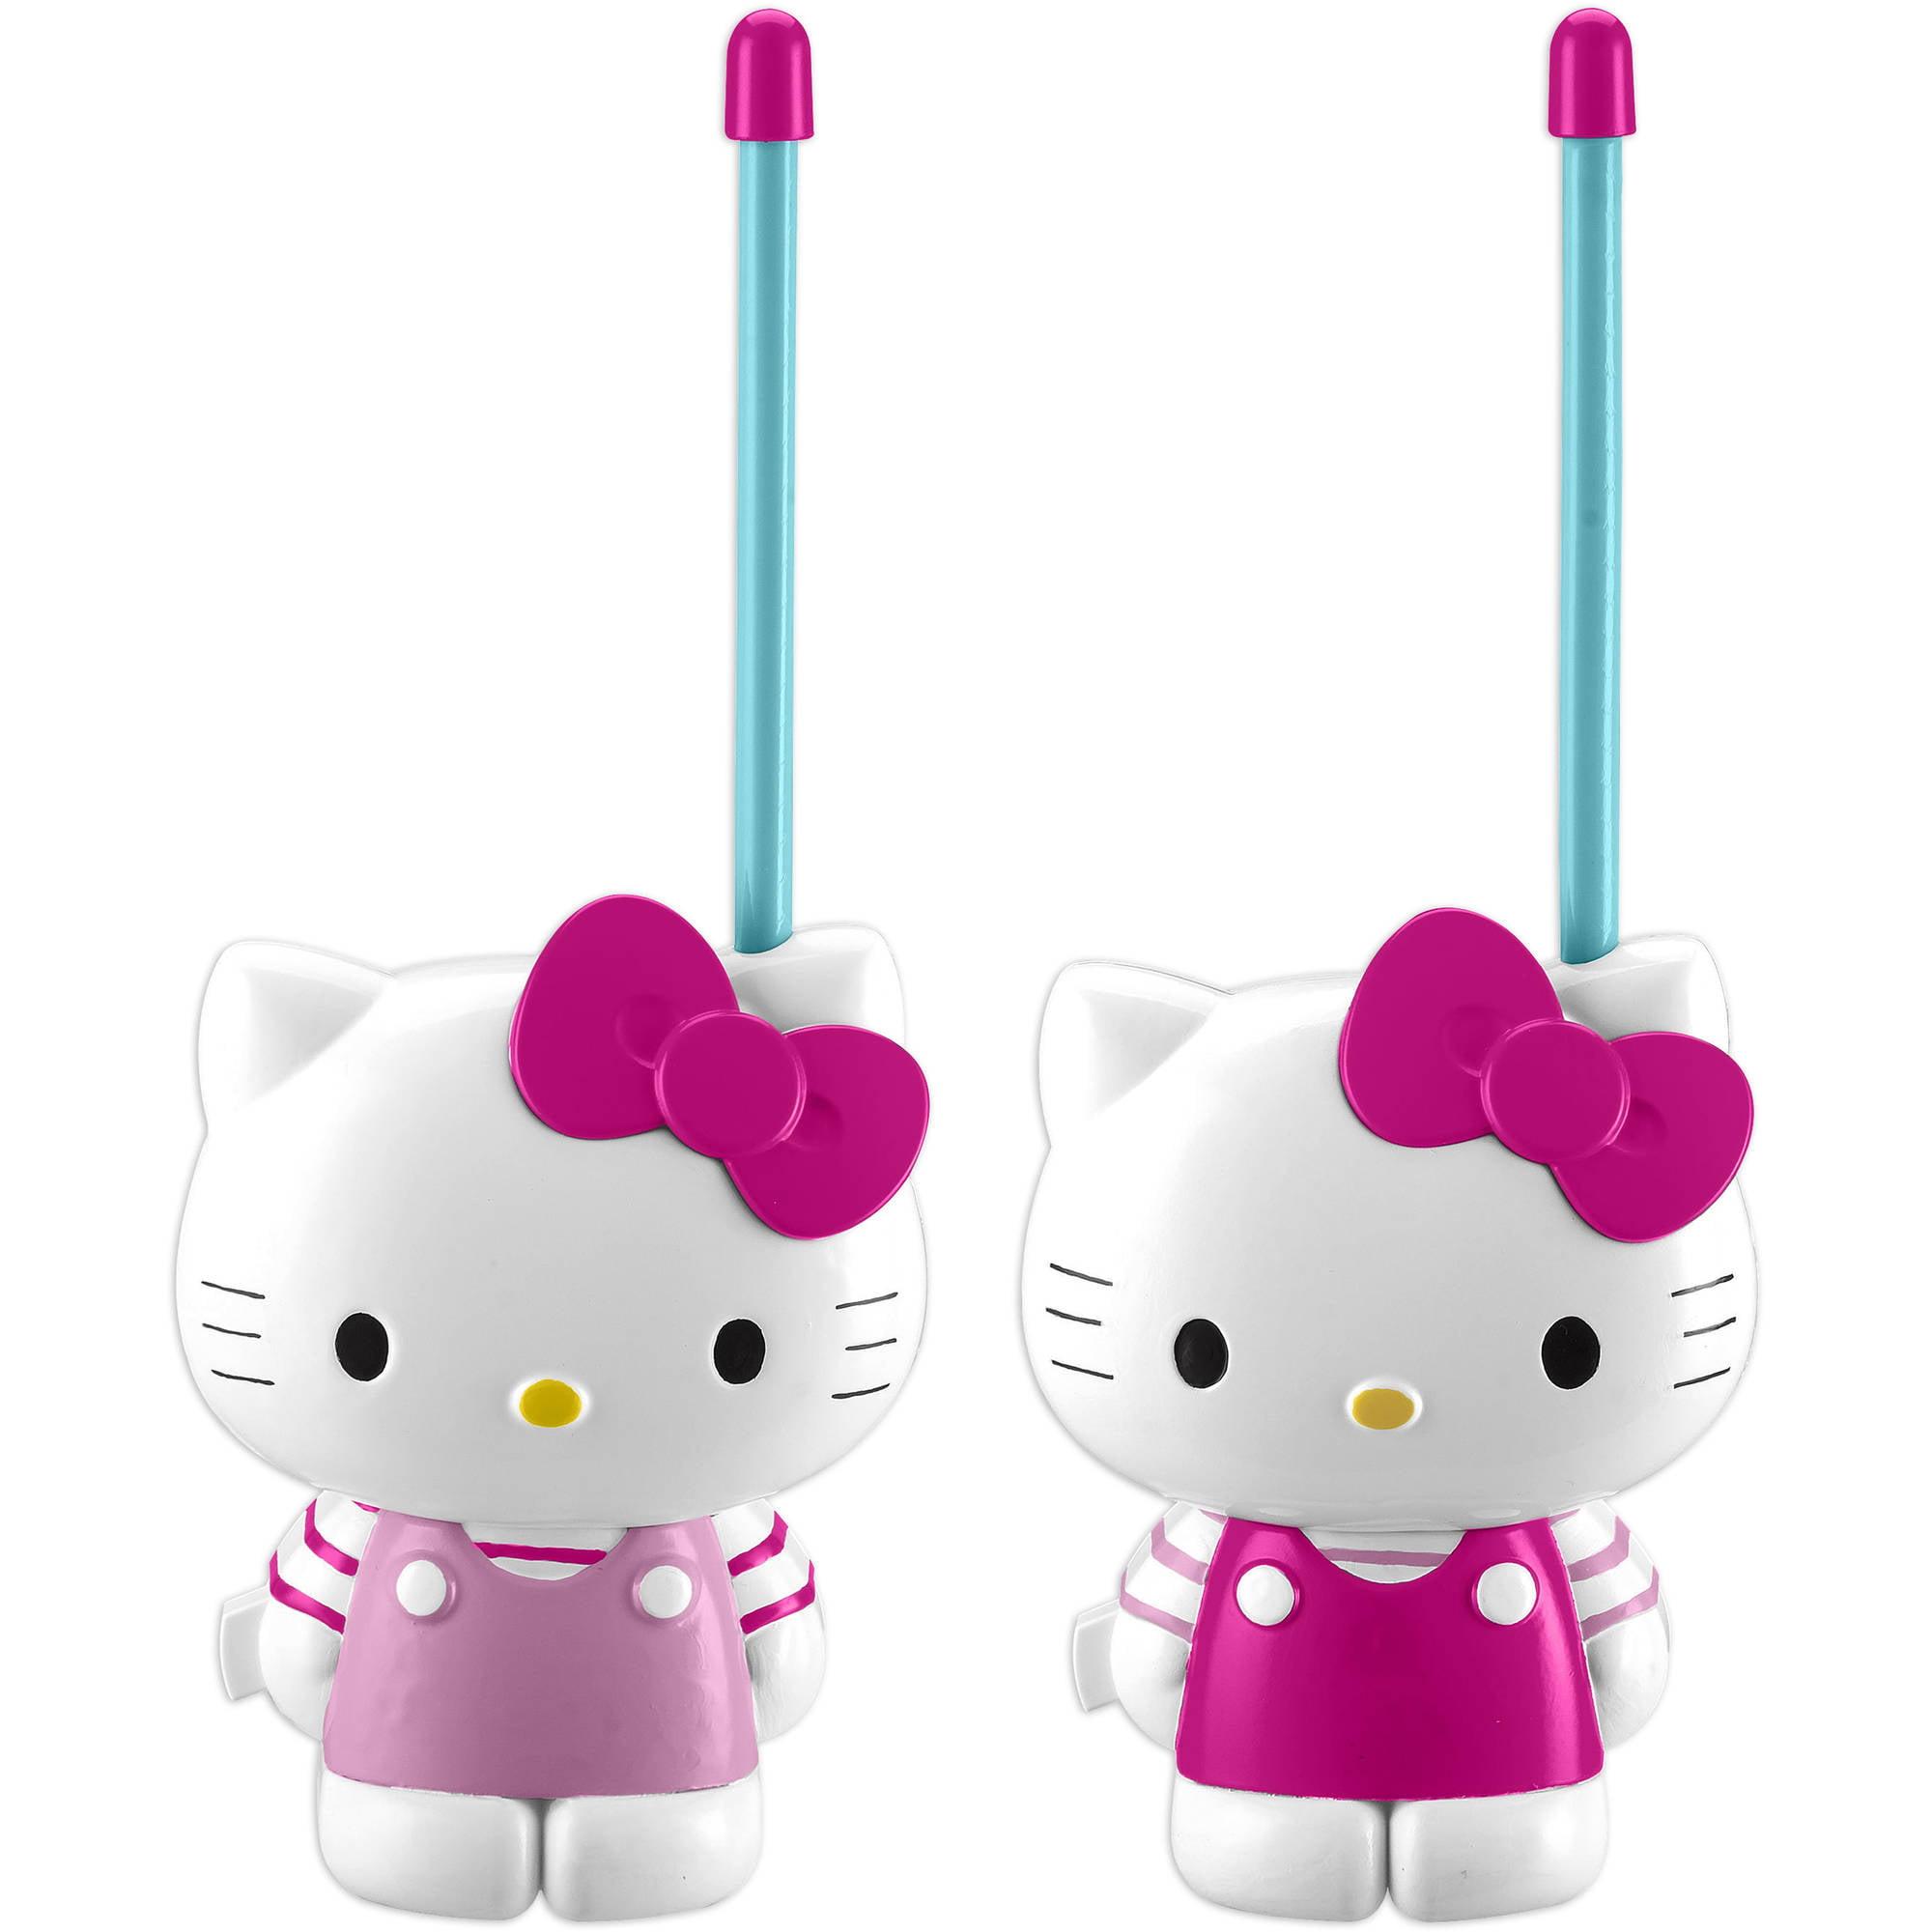 Sanrio Hello Kitty Short-Range Walkie Talkies by Kiddesigns